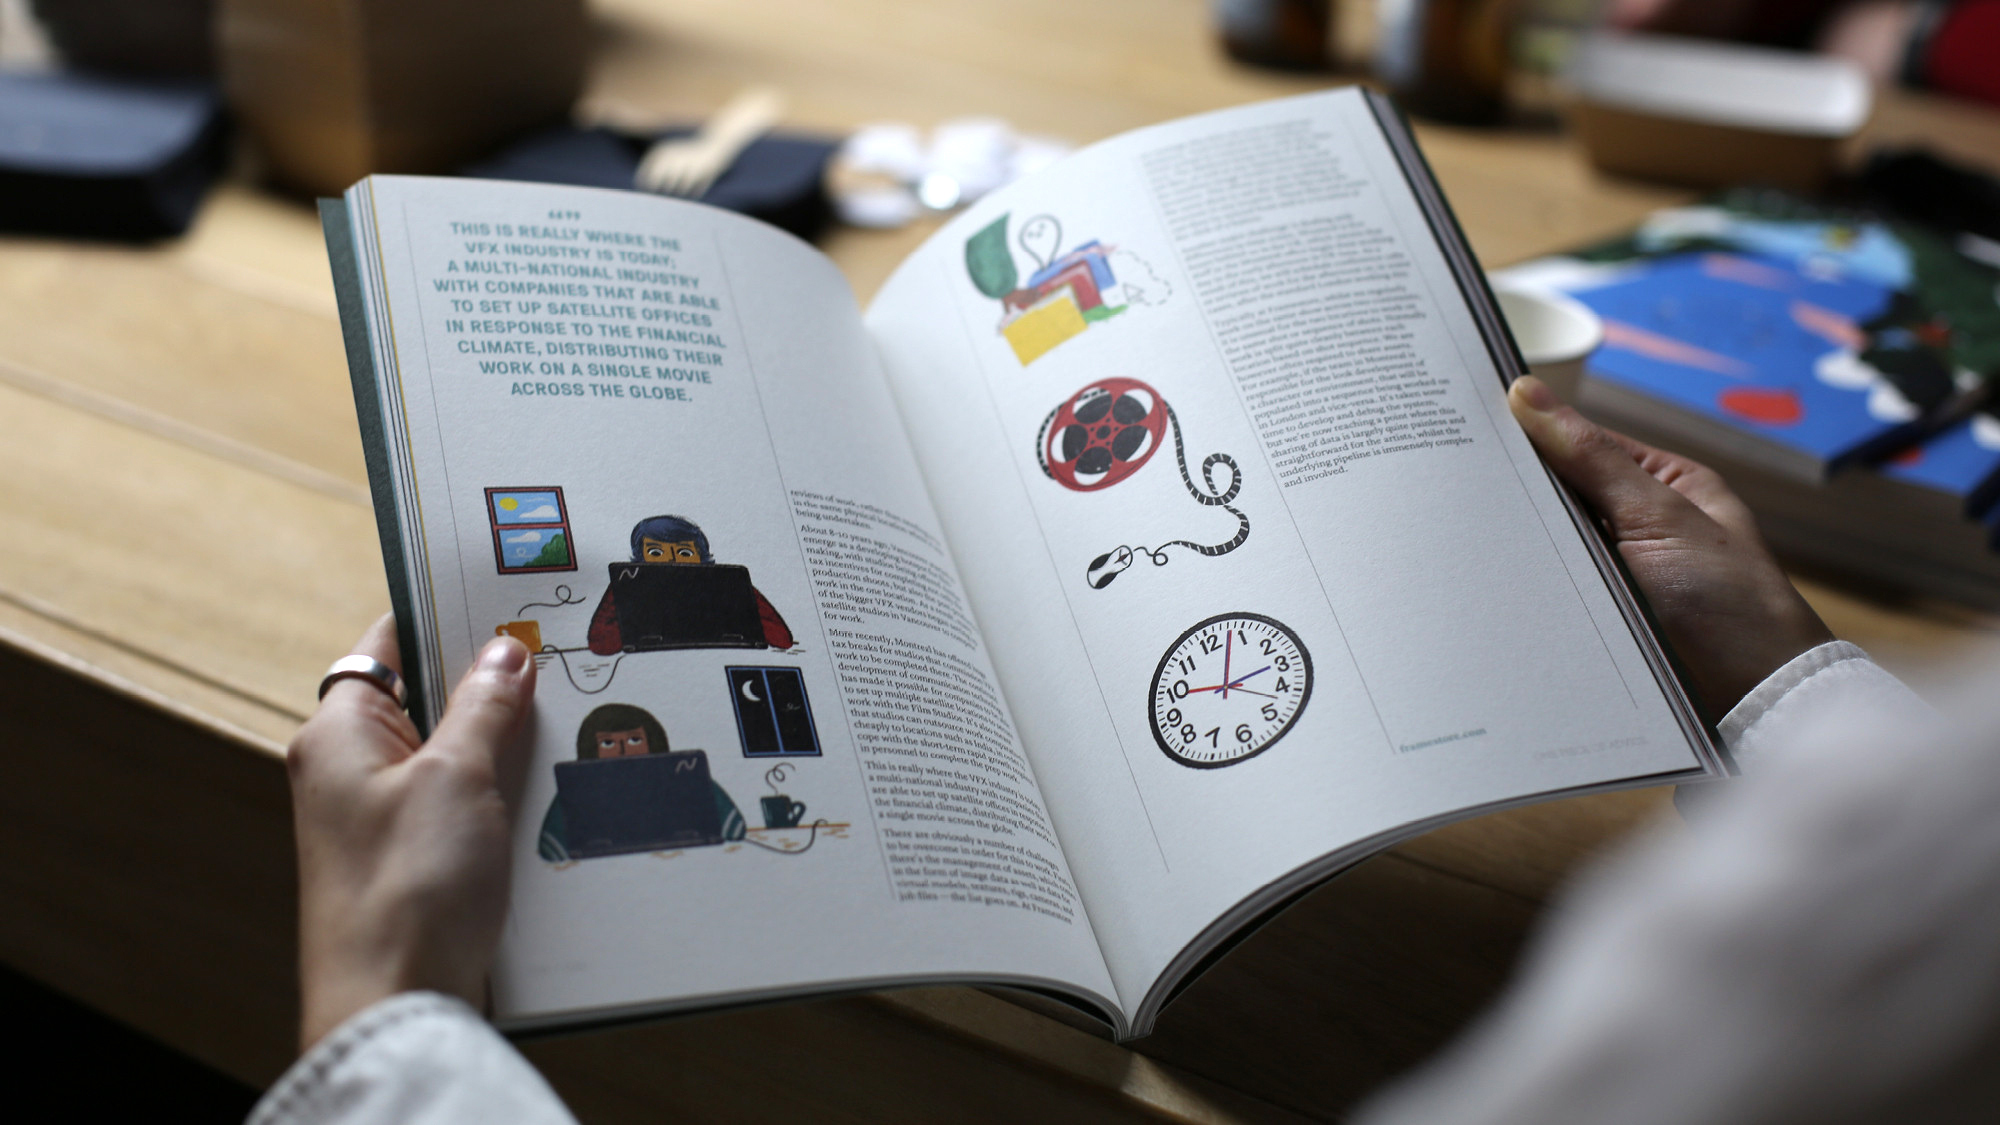 One-piece-advice-magazine-spread-evening.jpg